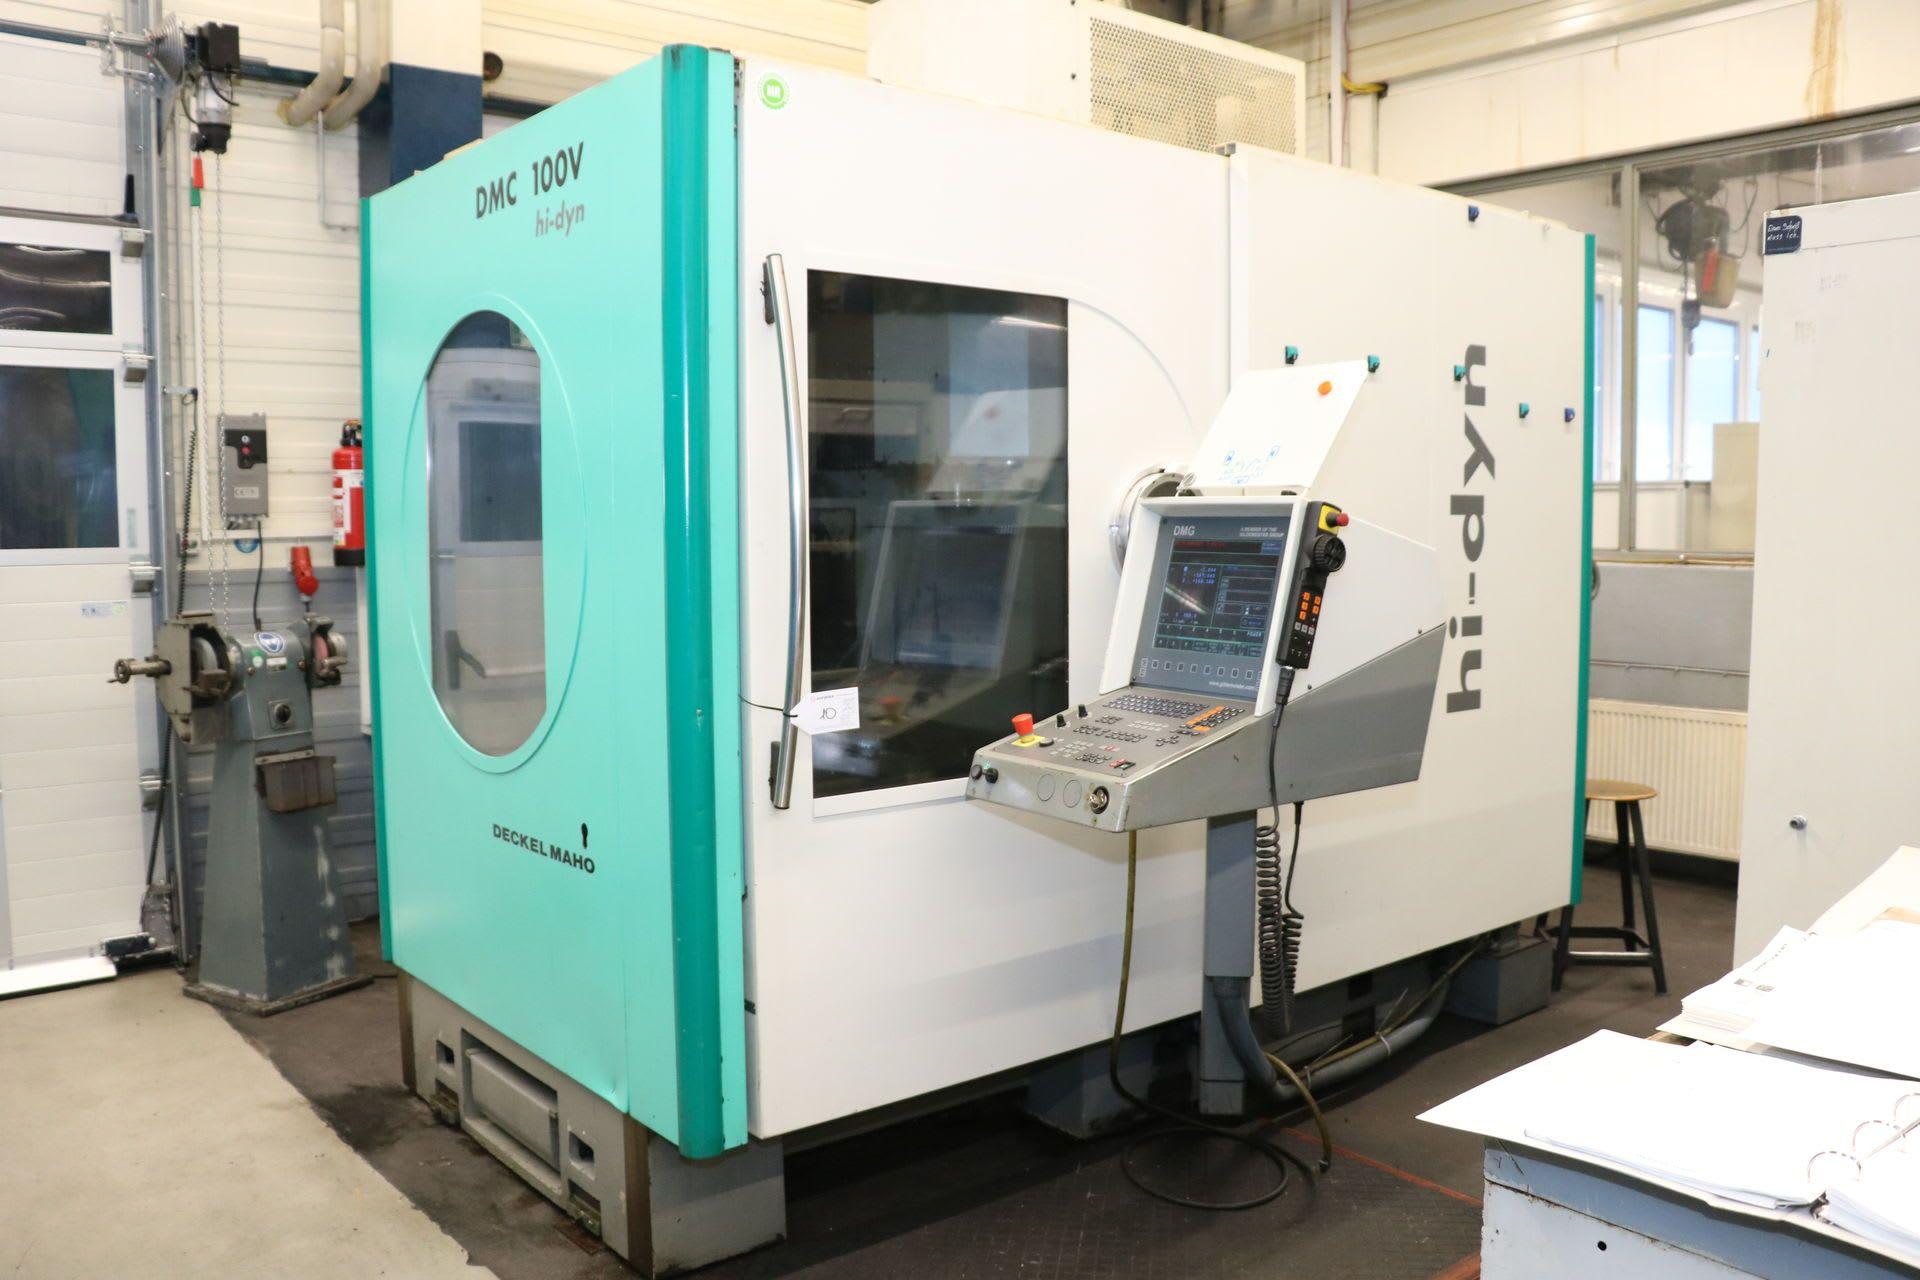 DECKEL MAHO DMC 100 V hi-dyn Vertikal-Bearbeitungszentrum